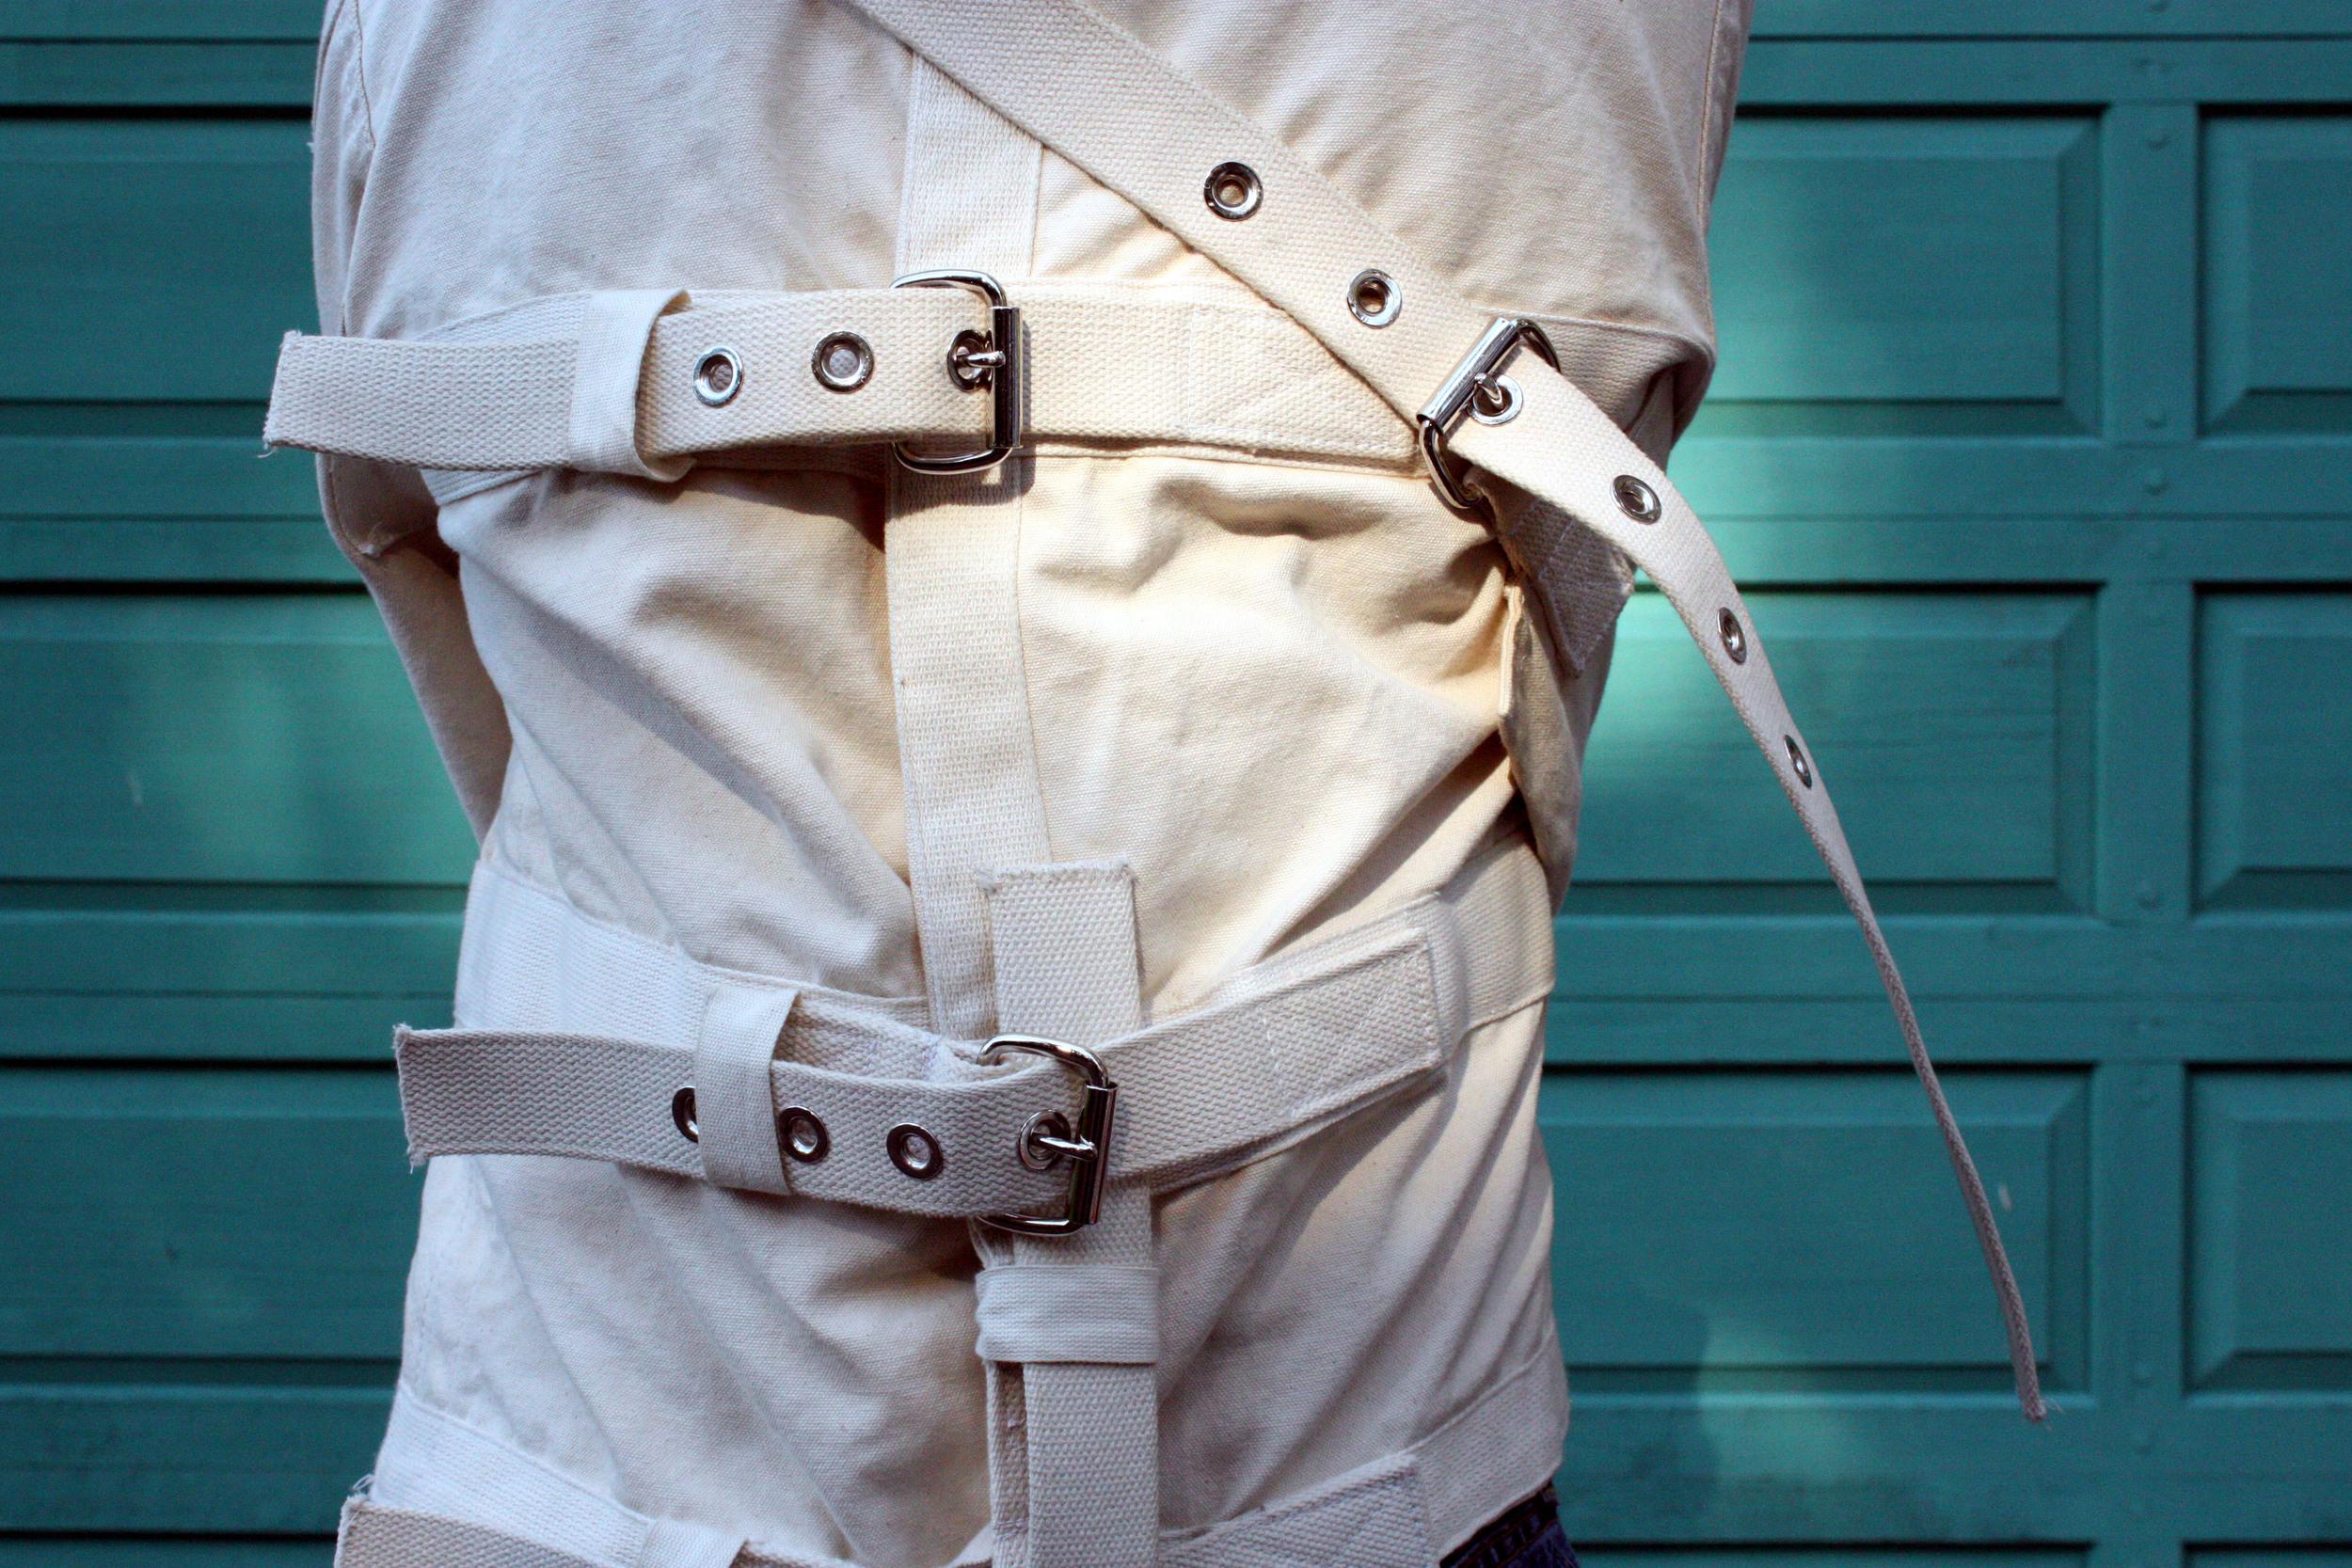 Gk Straight Jacket 3.jpg